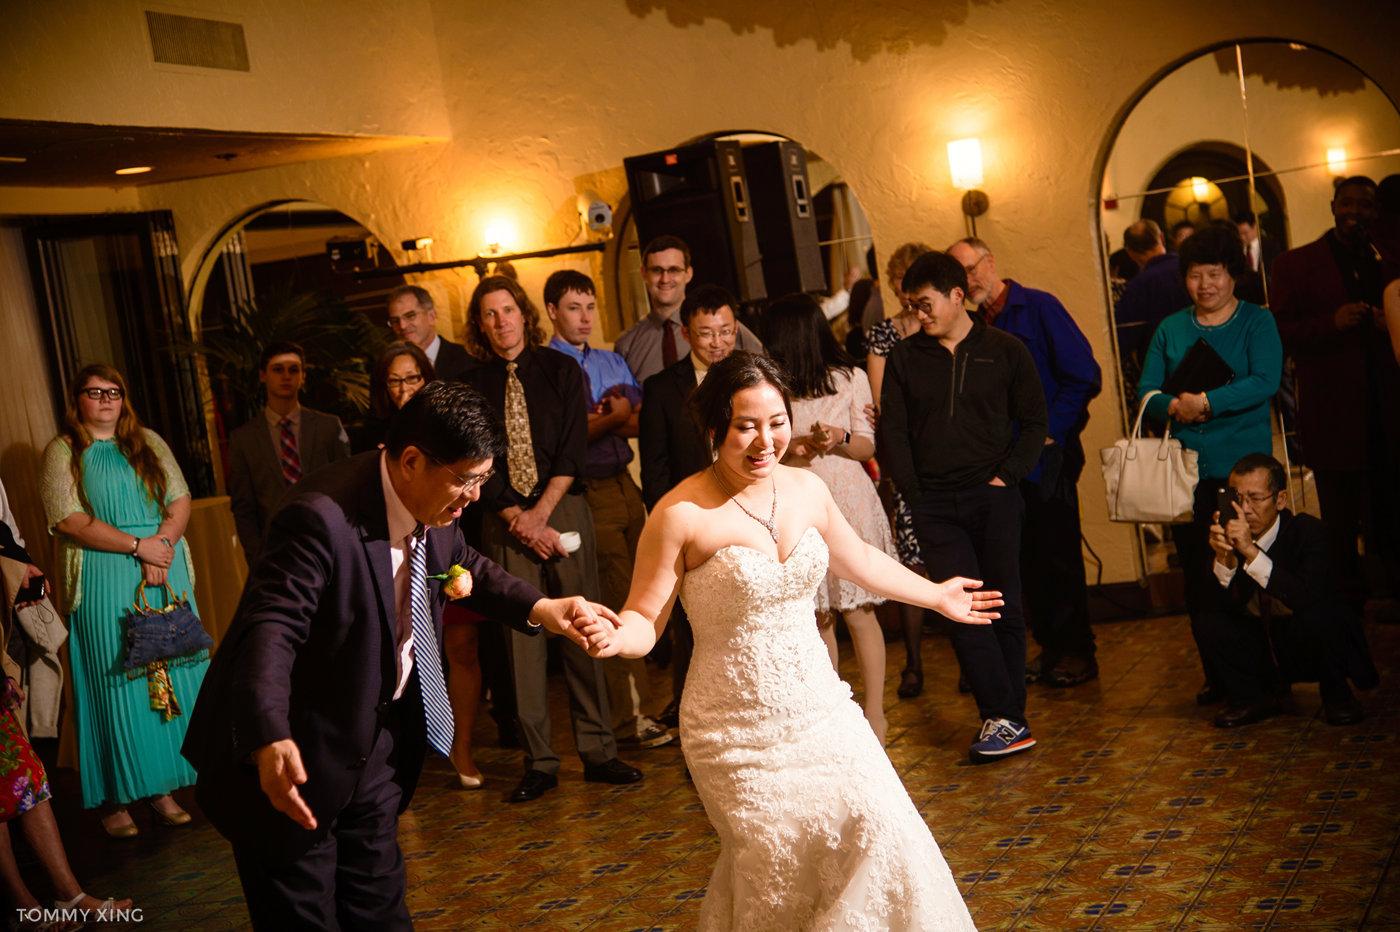 STANFORD MEMORIAL CHURCH WEDDING - Wenjie & Chengcheng - SAN FRANCISCO BAY AREA 斯坦福教堂婚礼跟拍 - 洛杉矶婚礼婚纱照摄影师 Tommy Xing Photography261.jpg